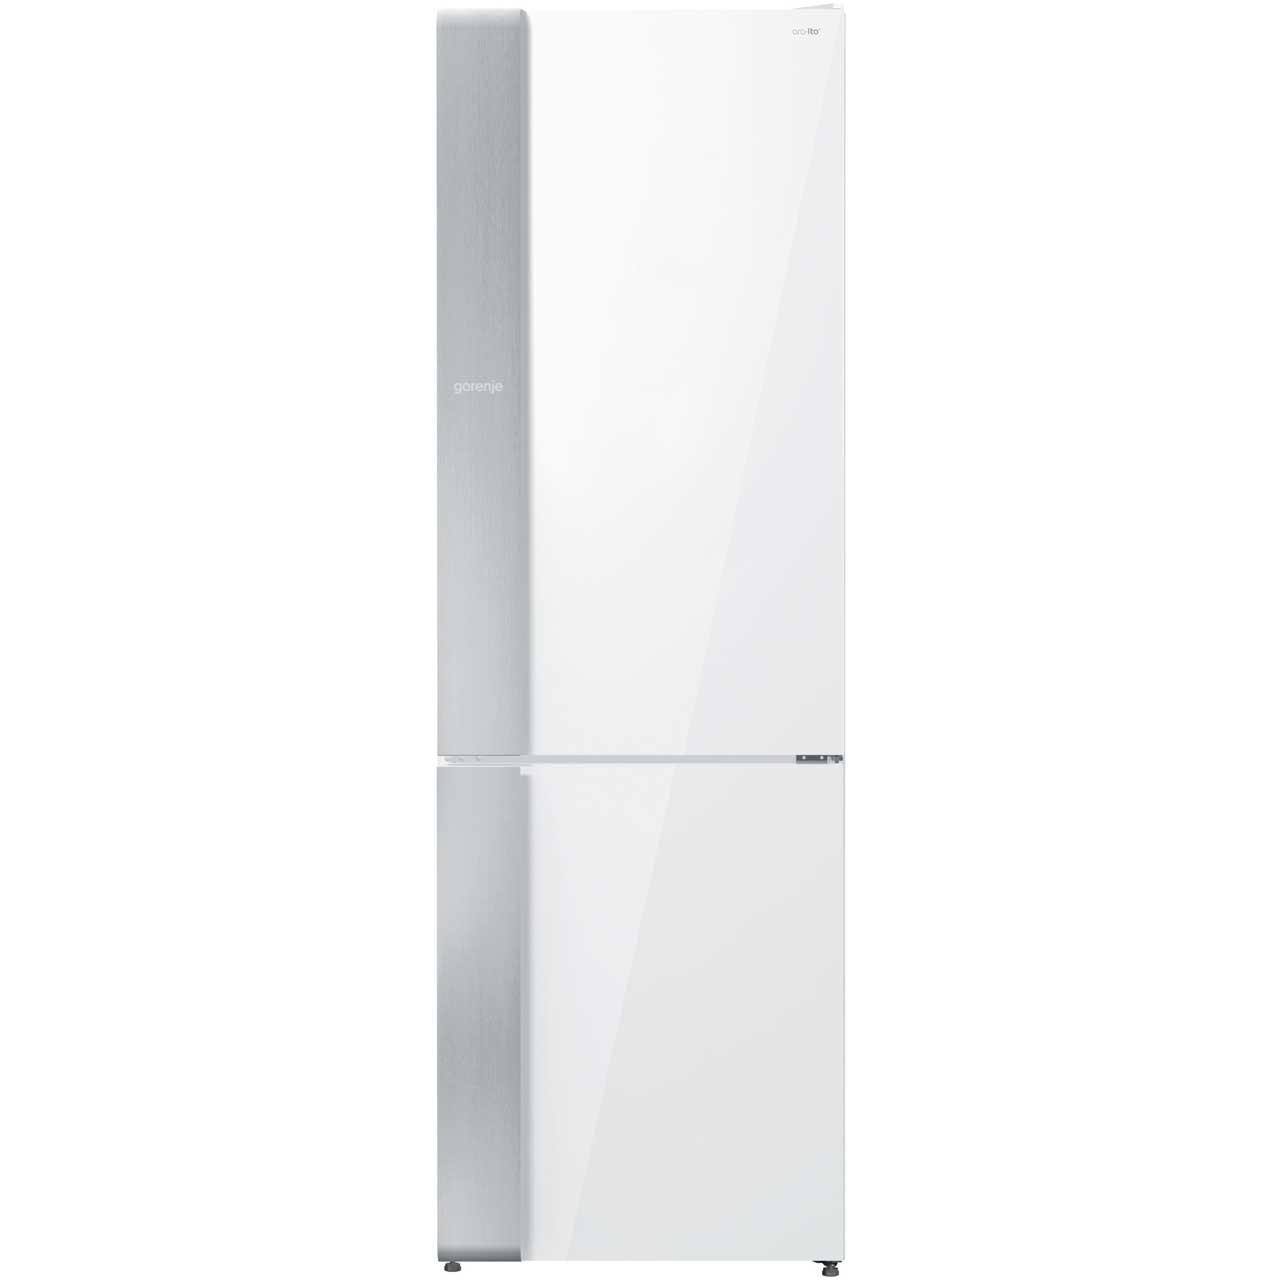 Gorenje OraÏto NRKORA62WUK Free Standing Fridge Freezer Frost Free in White